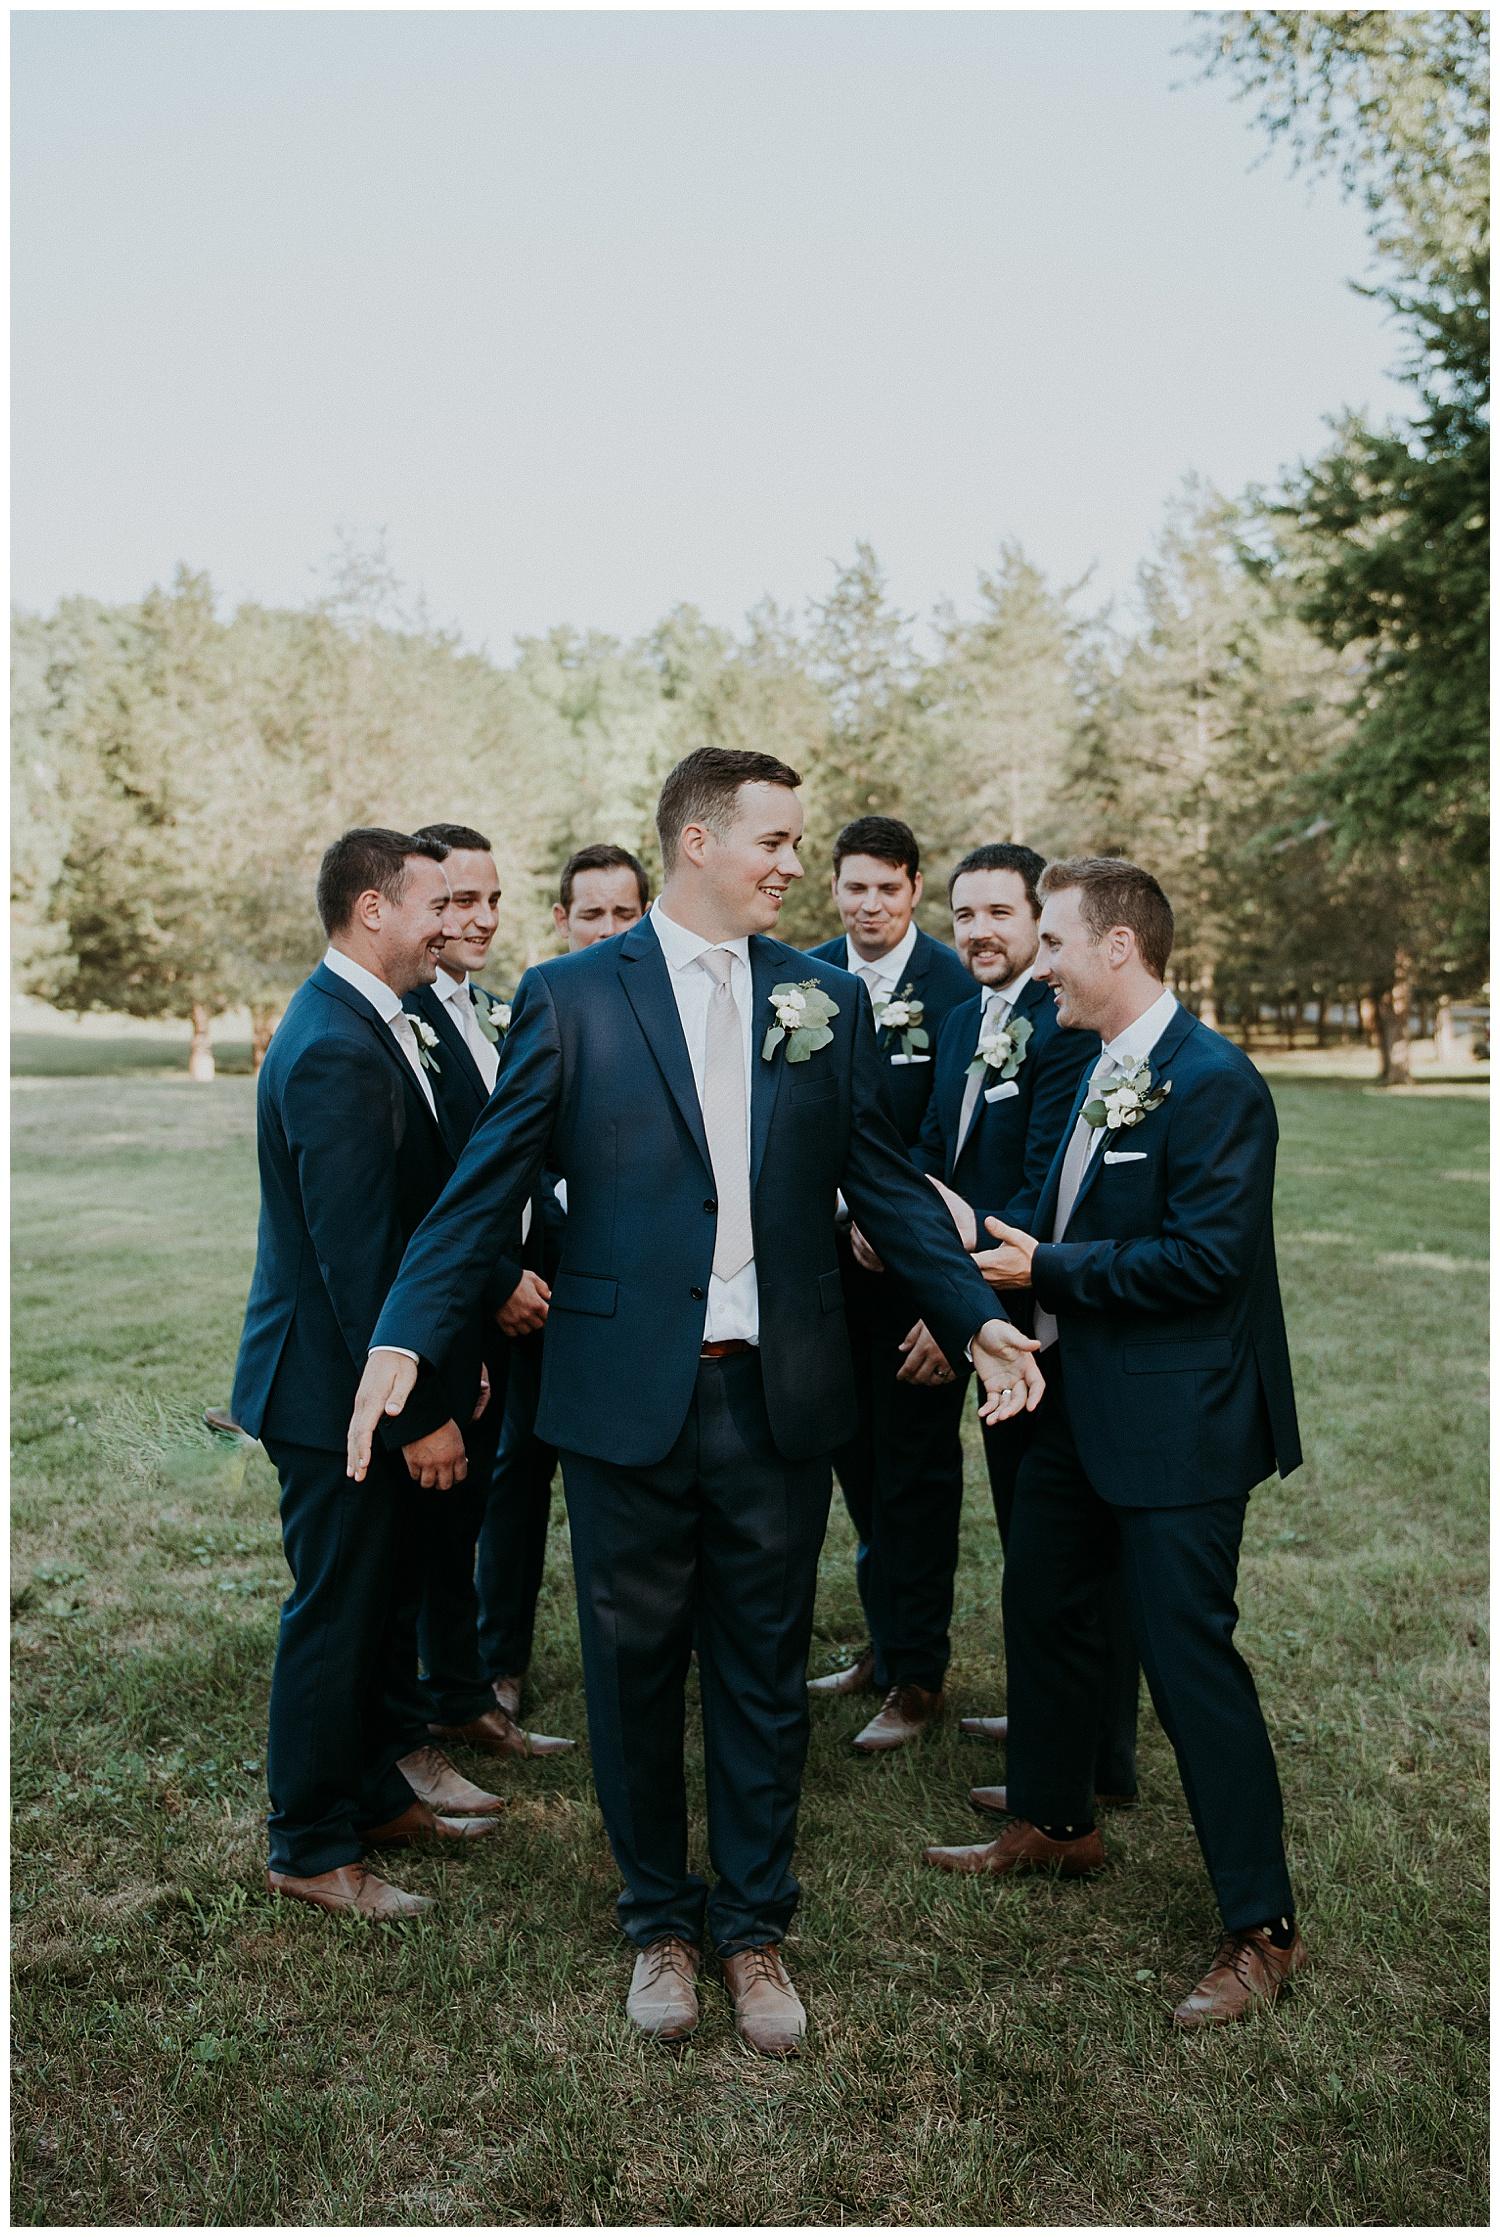 Holly McMurter Photographs | Prince Edward County Wedding Photography | Isaiah Tubbs Wedding On The Beach